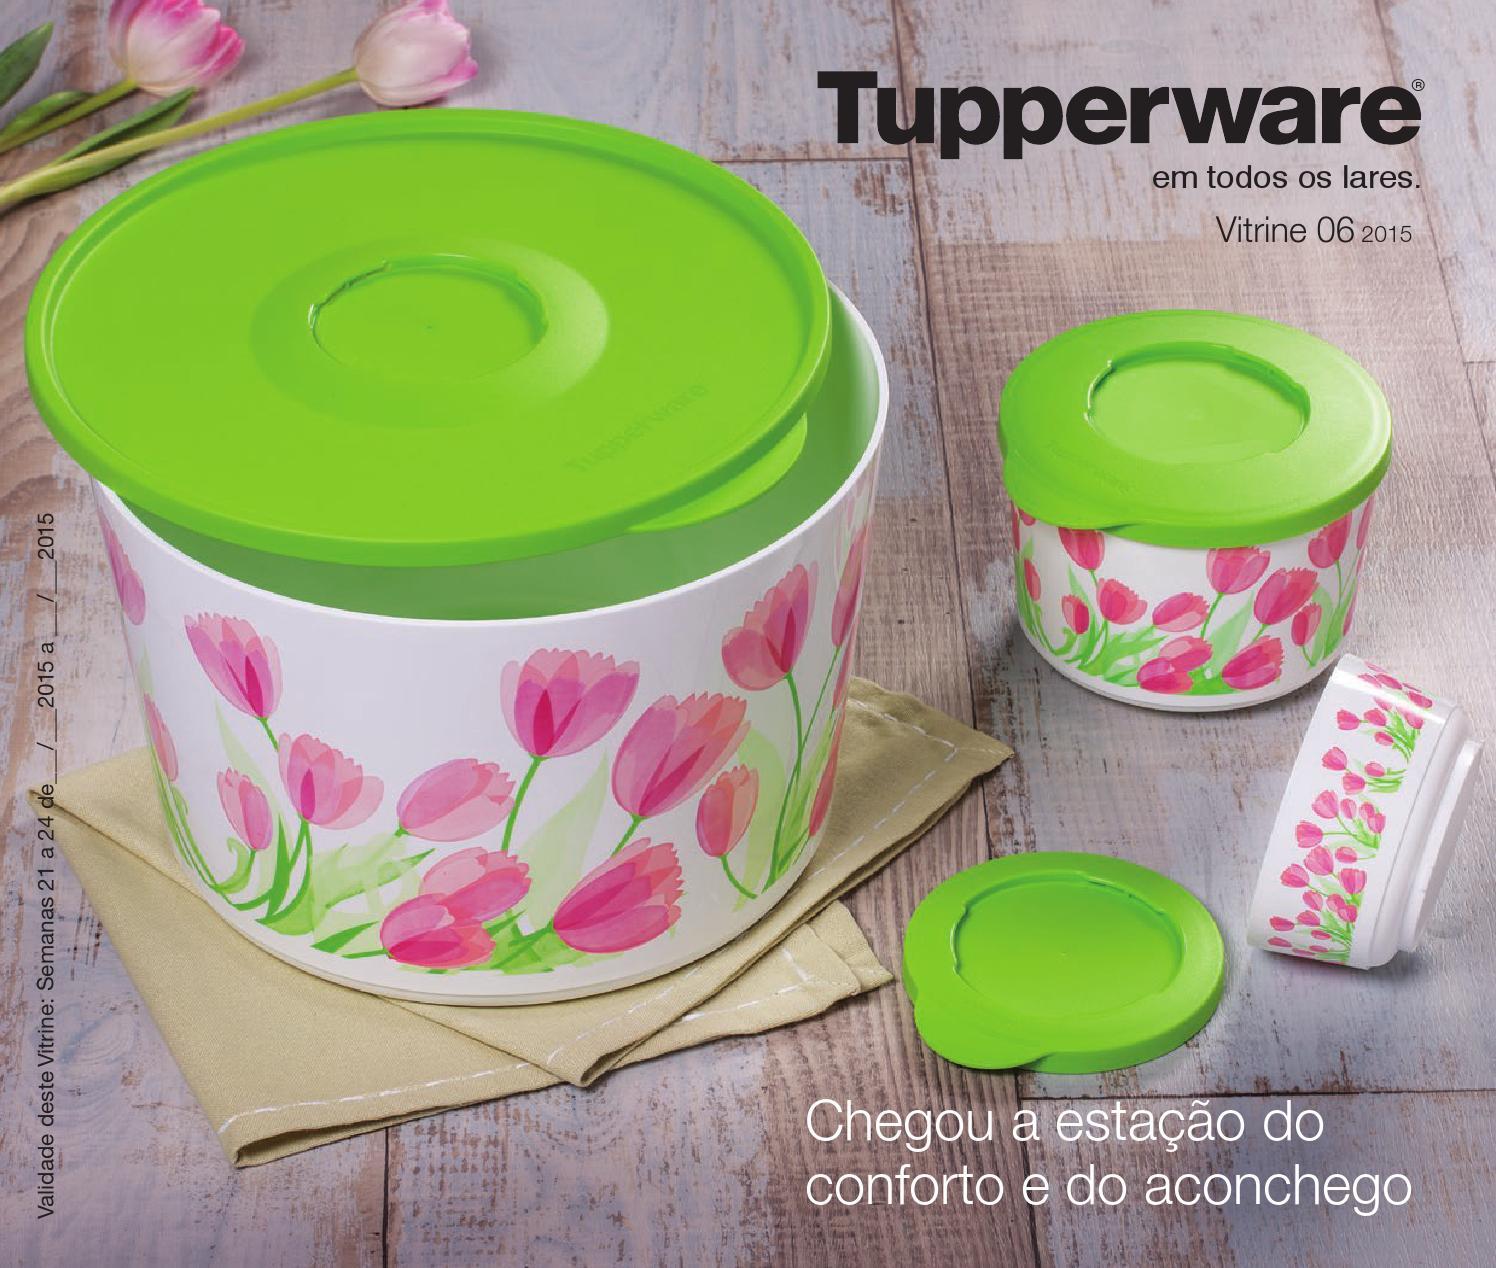 ISSUU - Vtitrine 06.2015 Tupperware by Tupperware Show